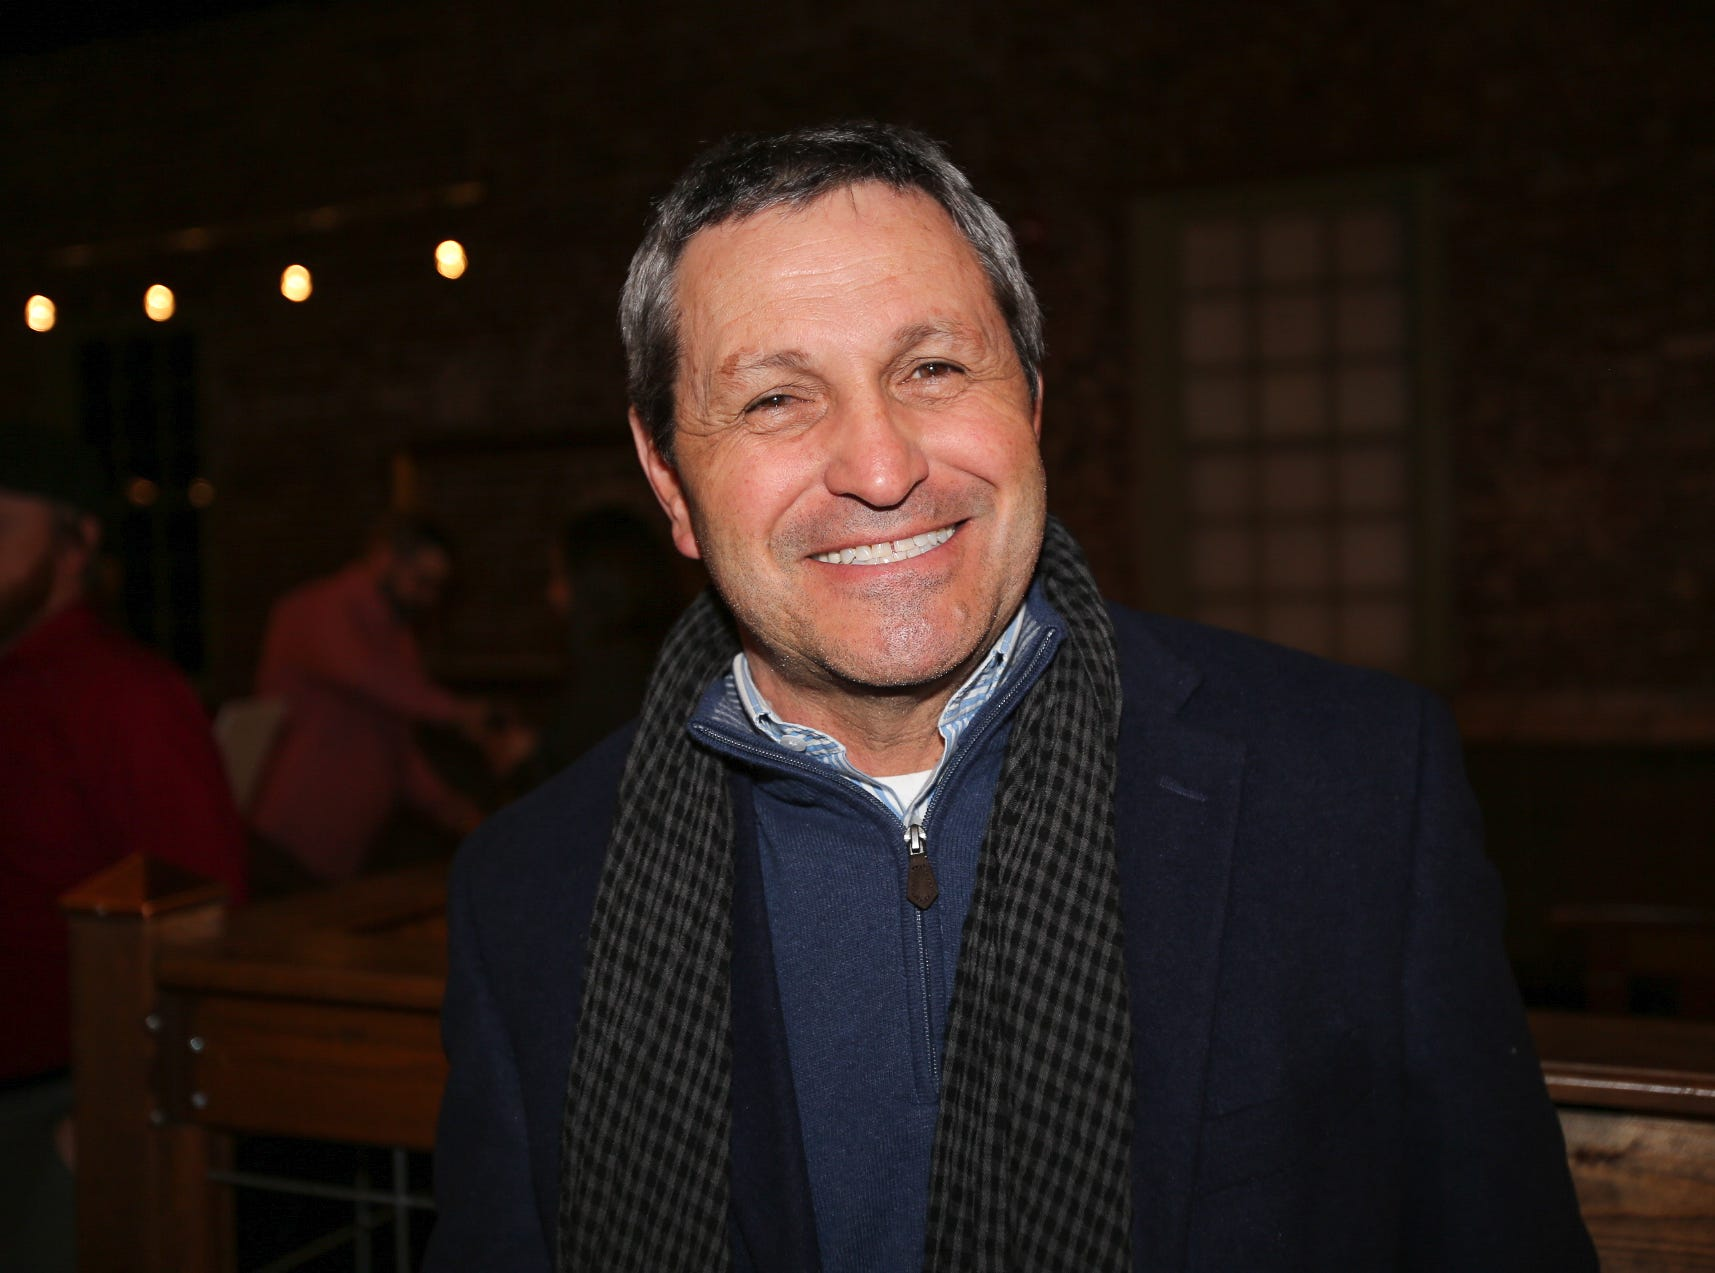 Ricardo Moncada